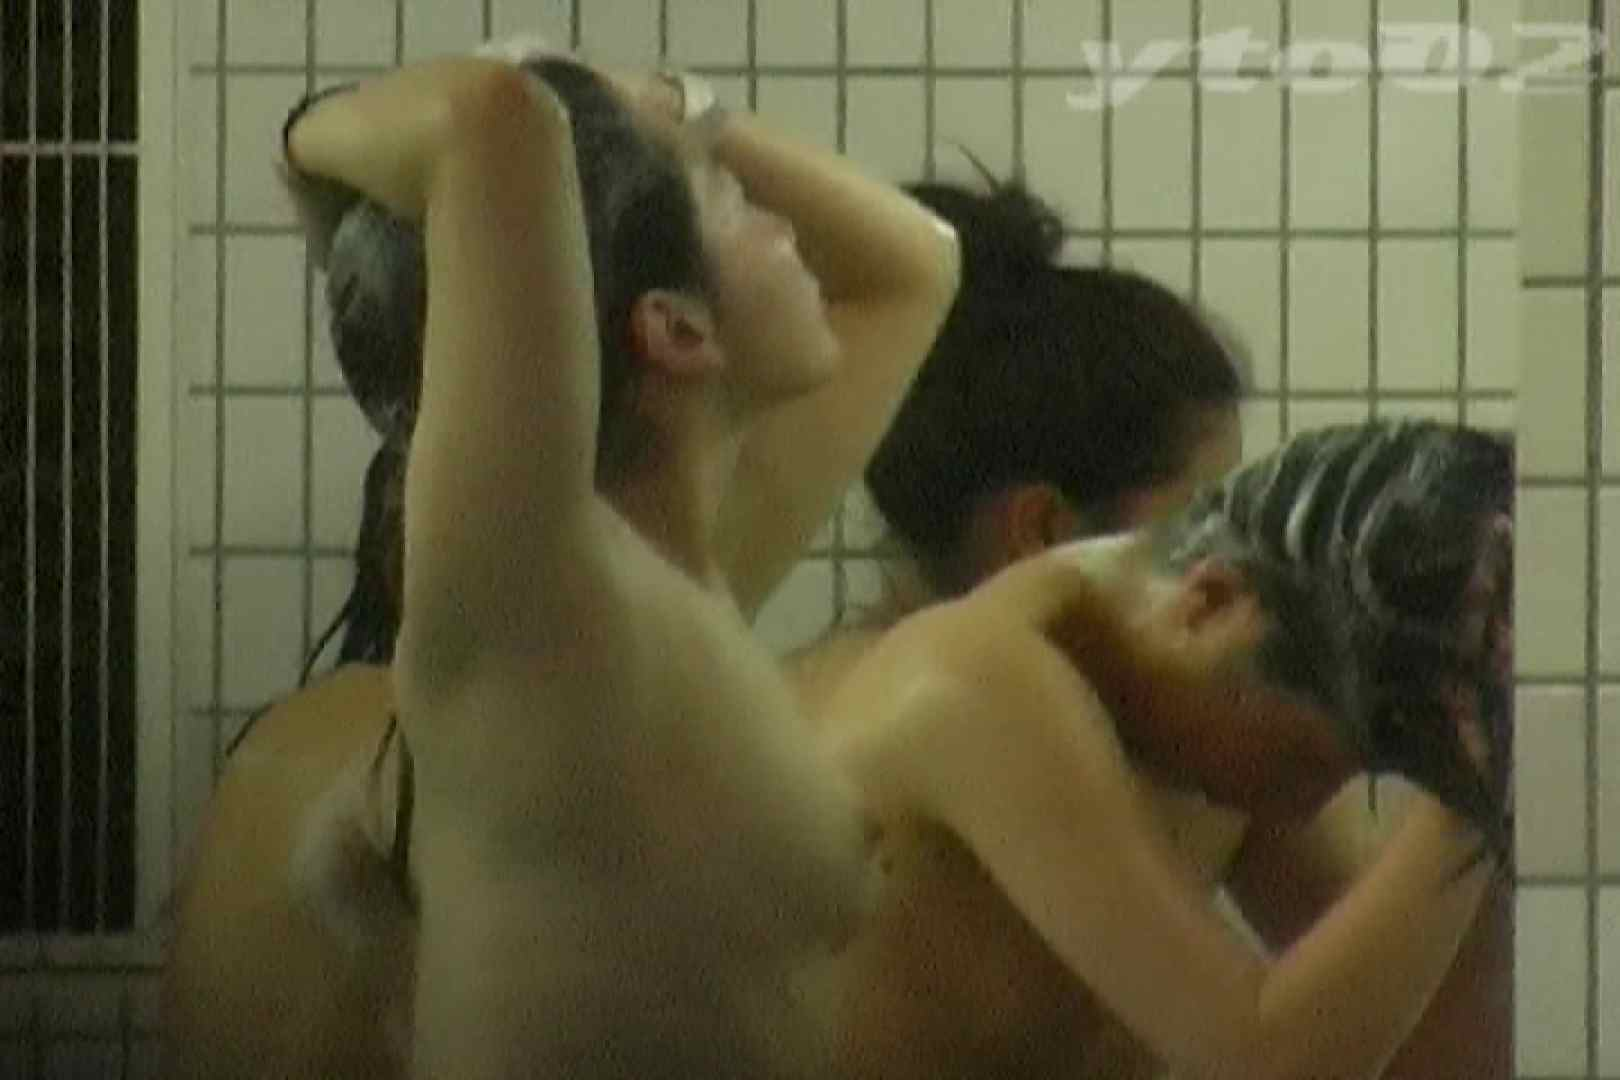 ▲復活限定▲合宿ホテル女風呂盗撮 Vol.12 女風呂 エロ無料画像 103枚 71